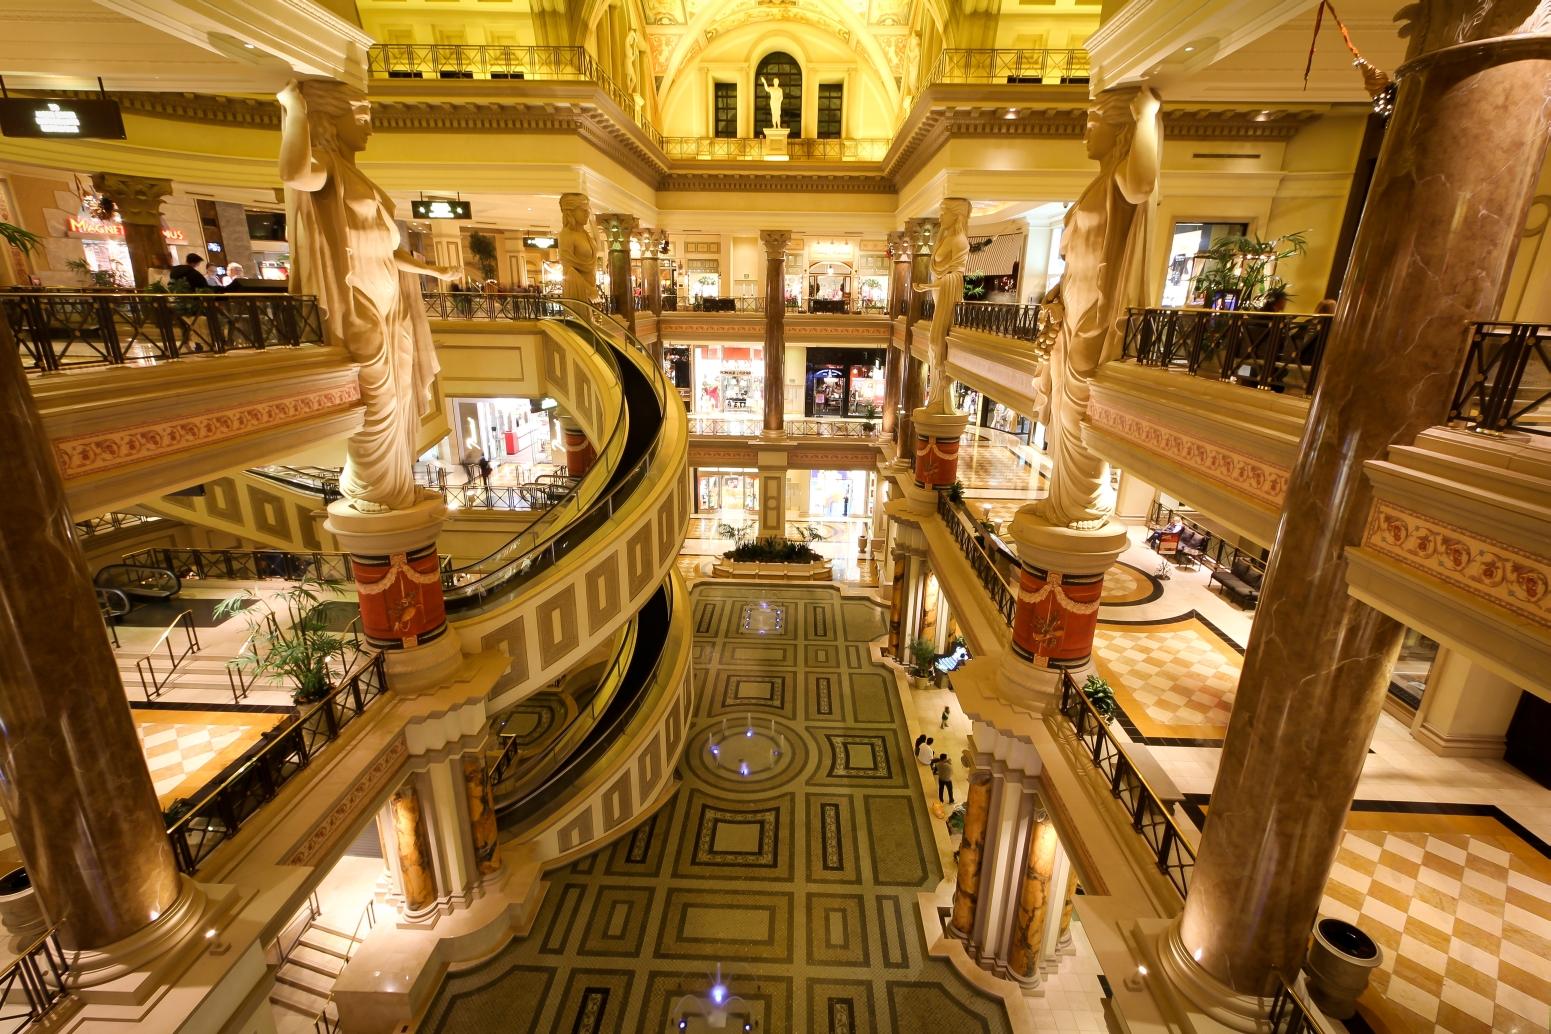 forum-shops-caesars-palace-30-1